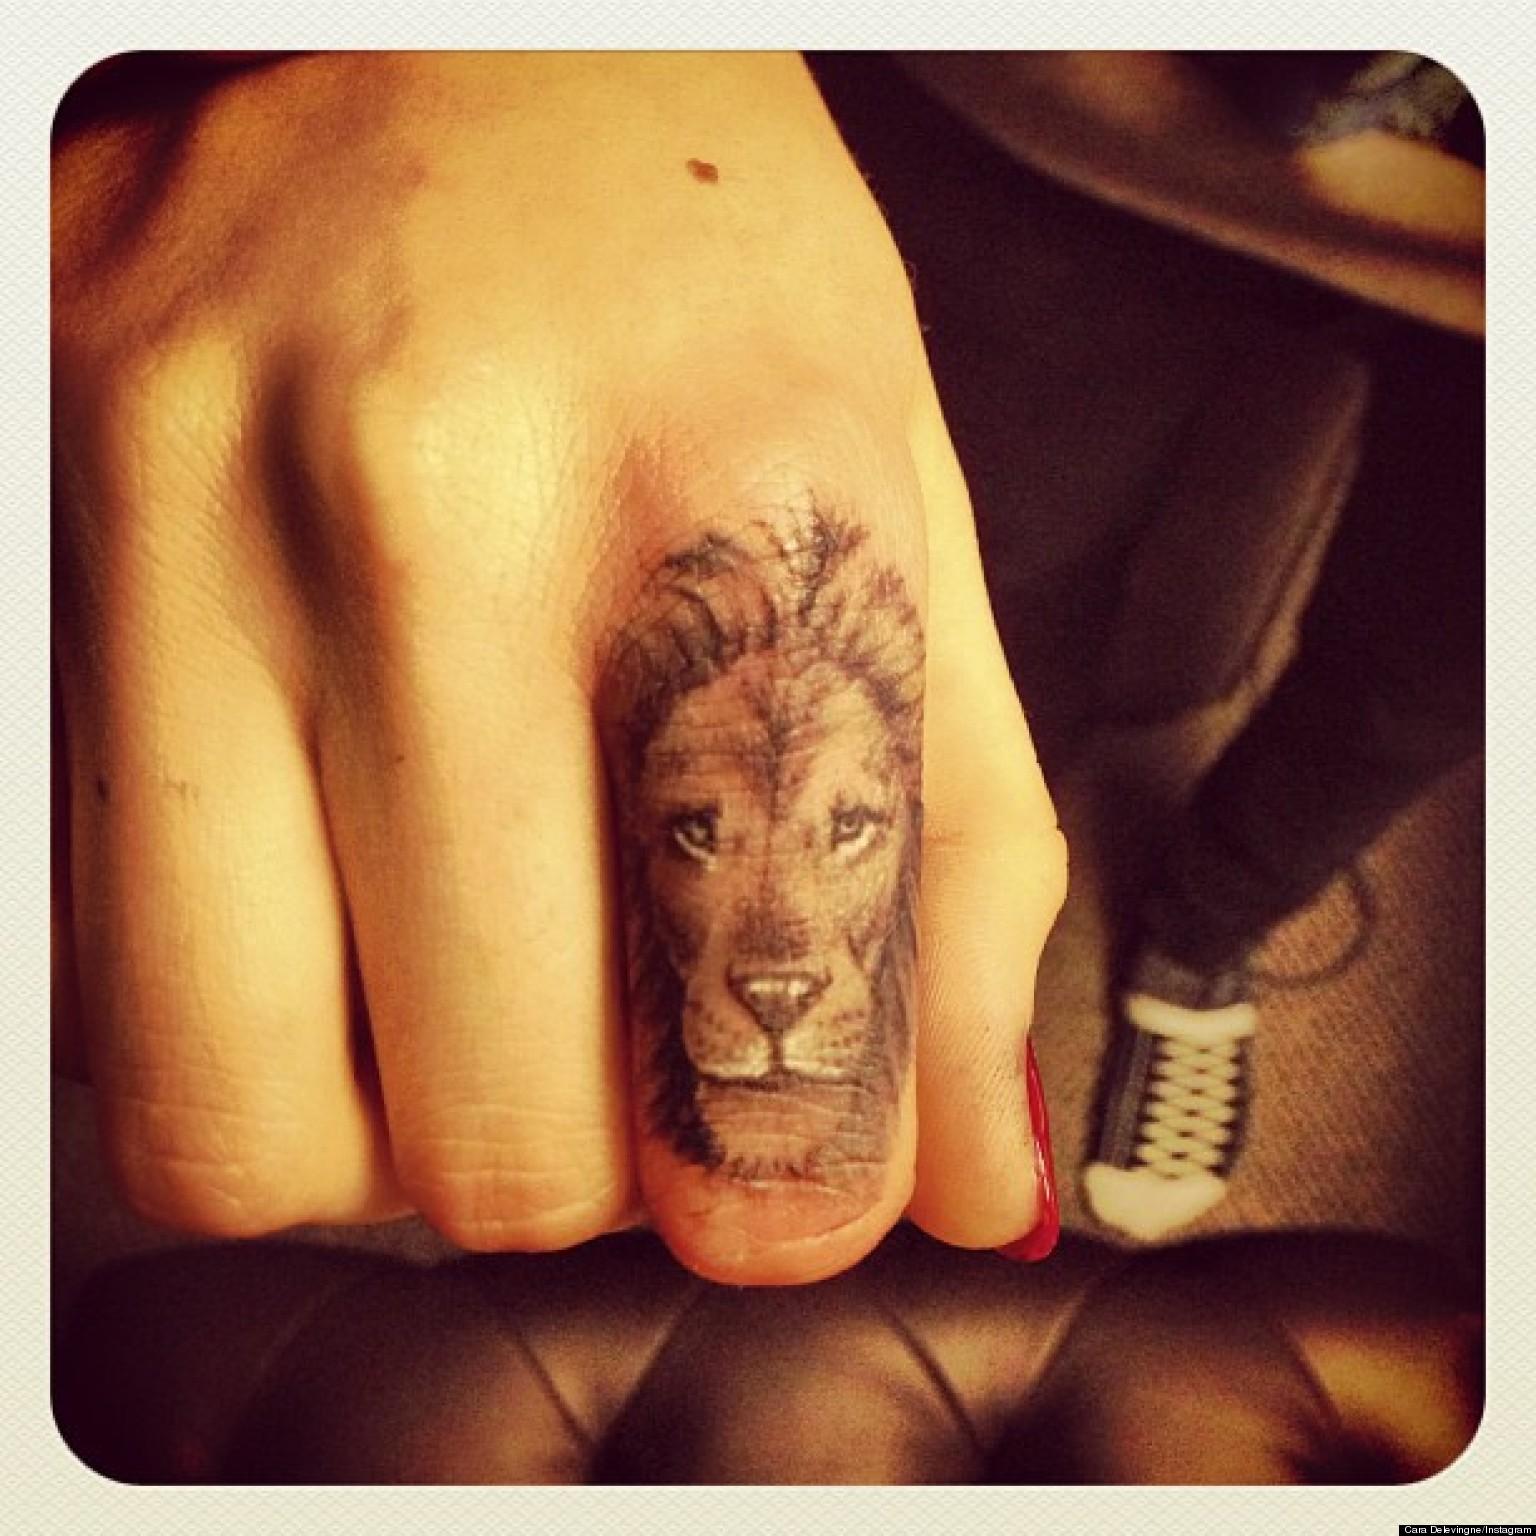 Cara delevingne debuts new lion tattoo on her finger for Finger lion tattoo